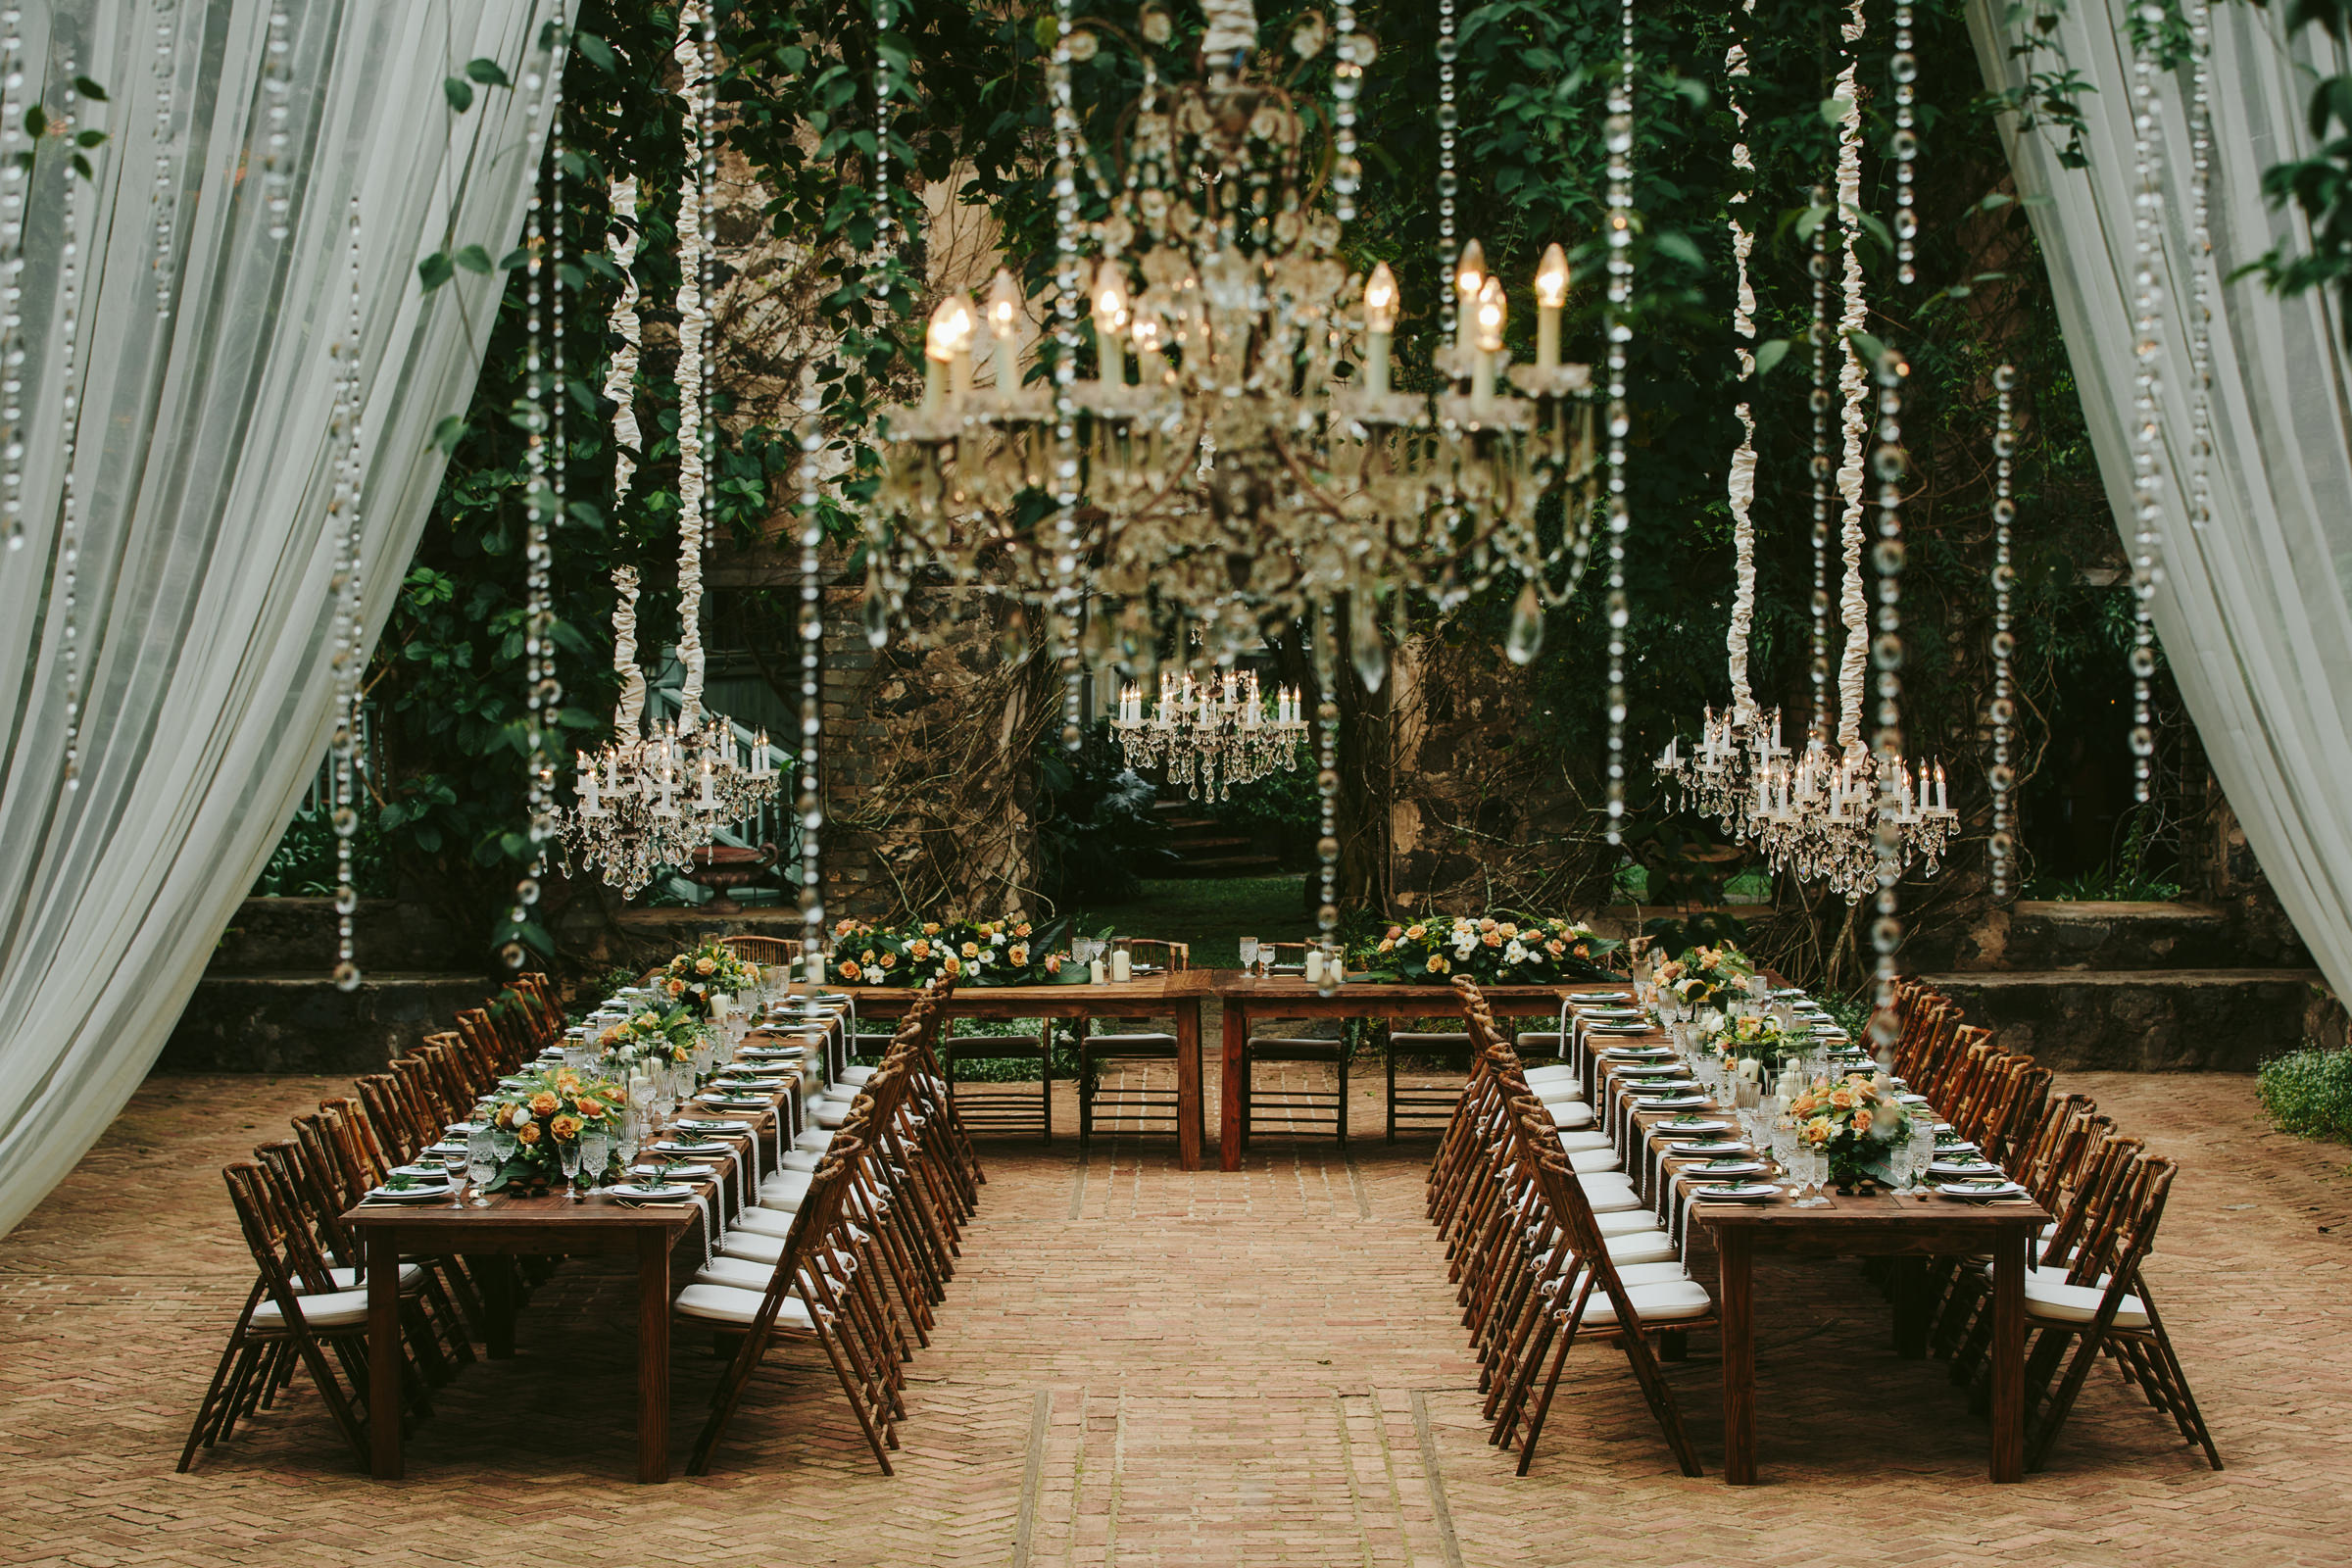 Wedding reception seating at Haiku Mill Maui - photo by Melia Lucida